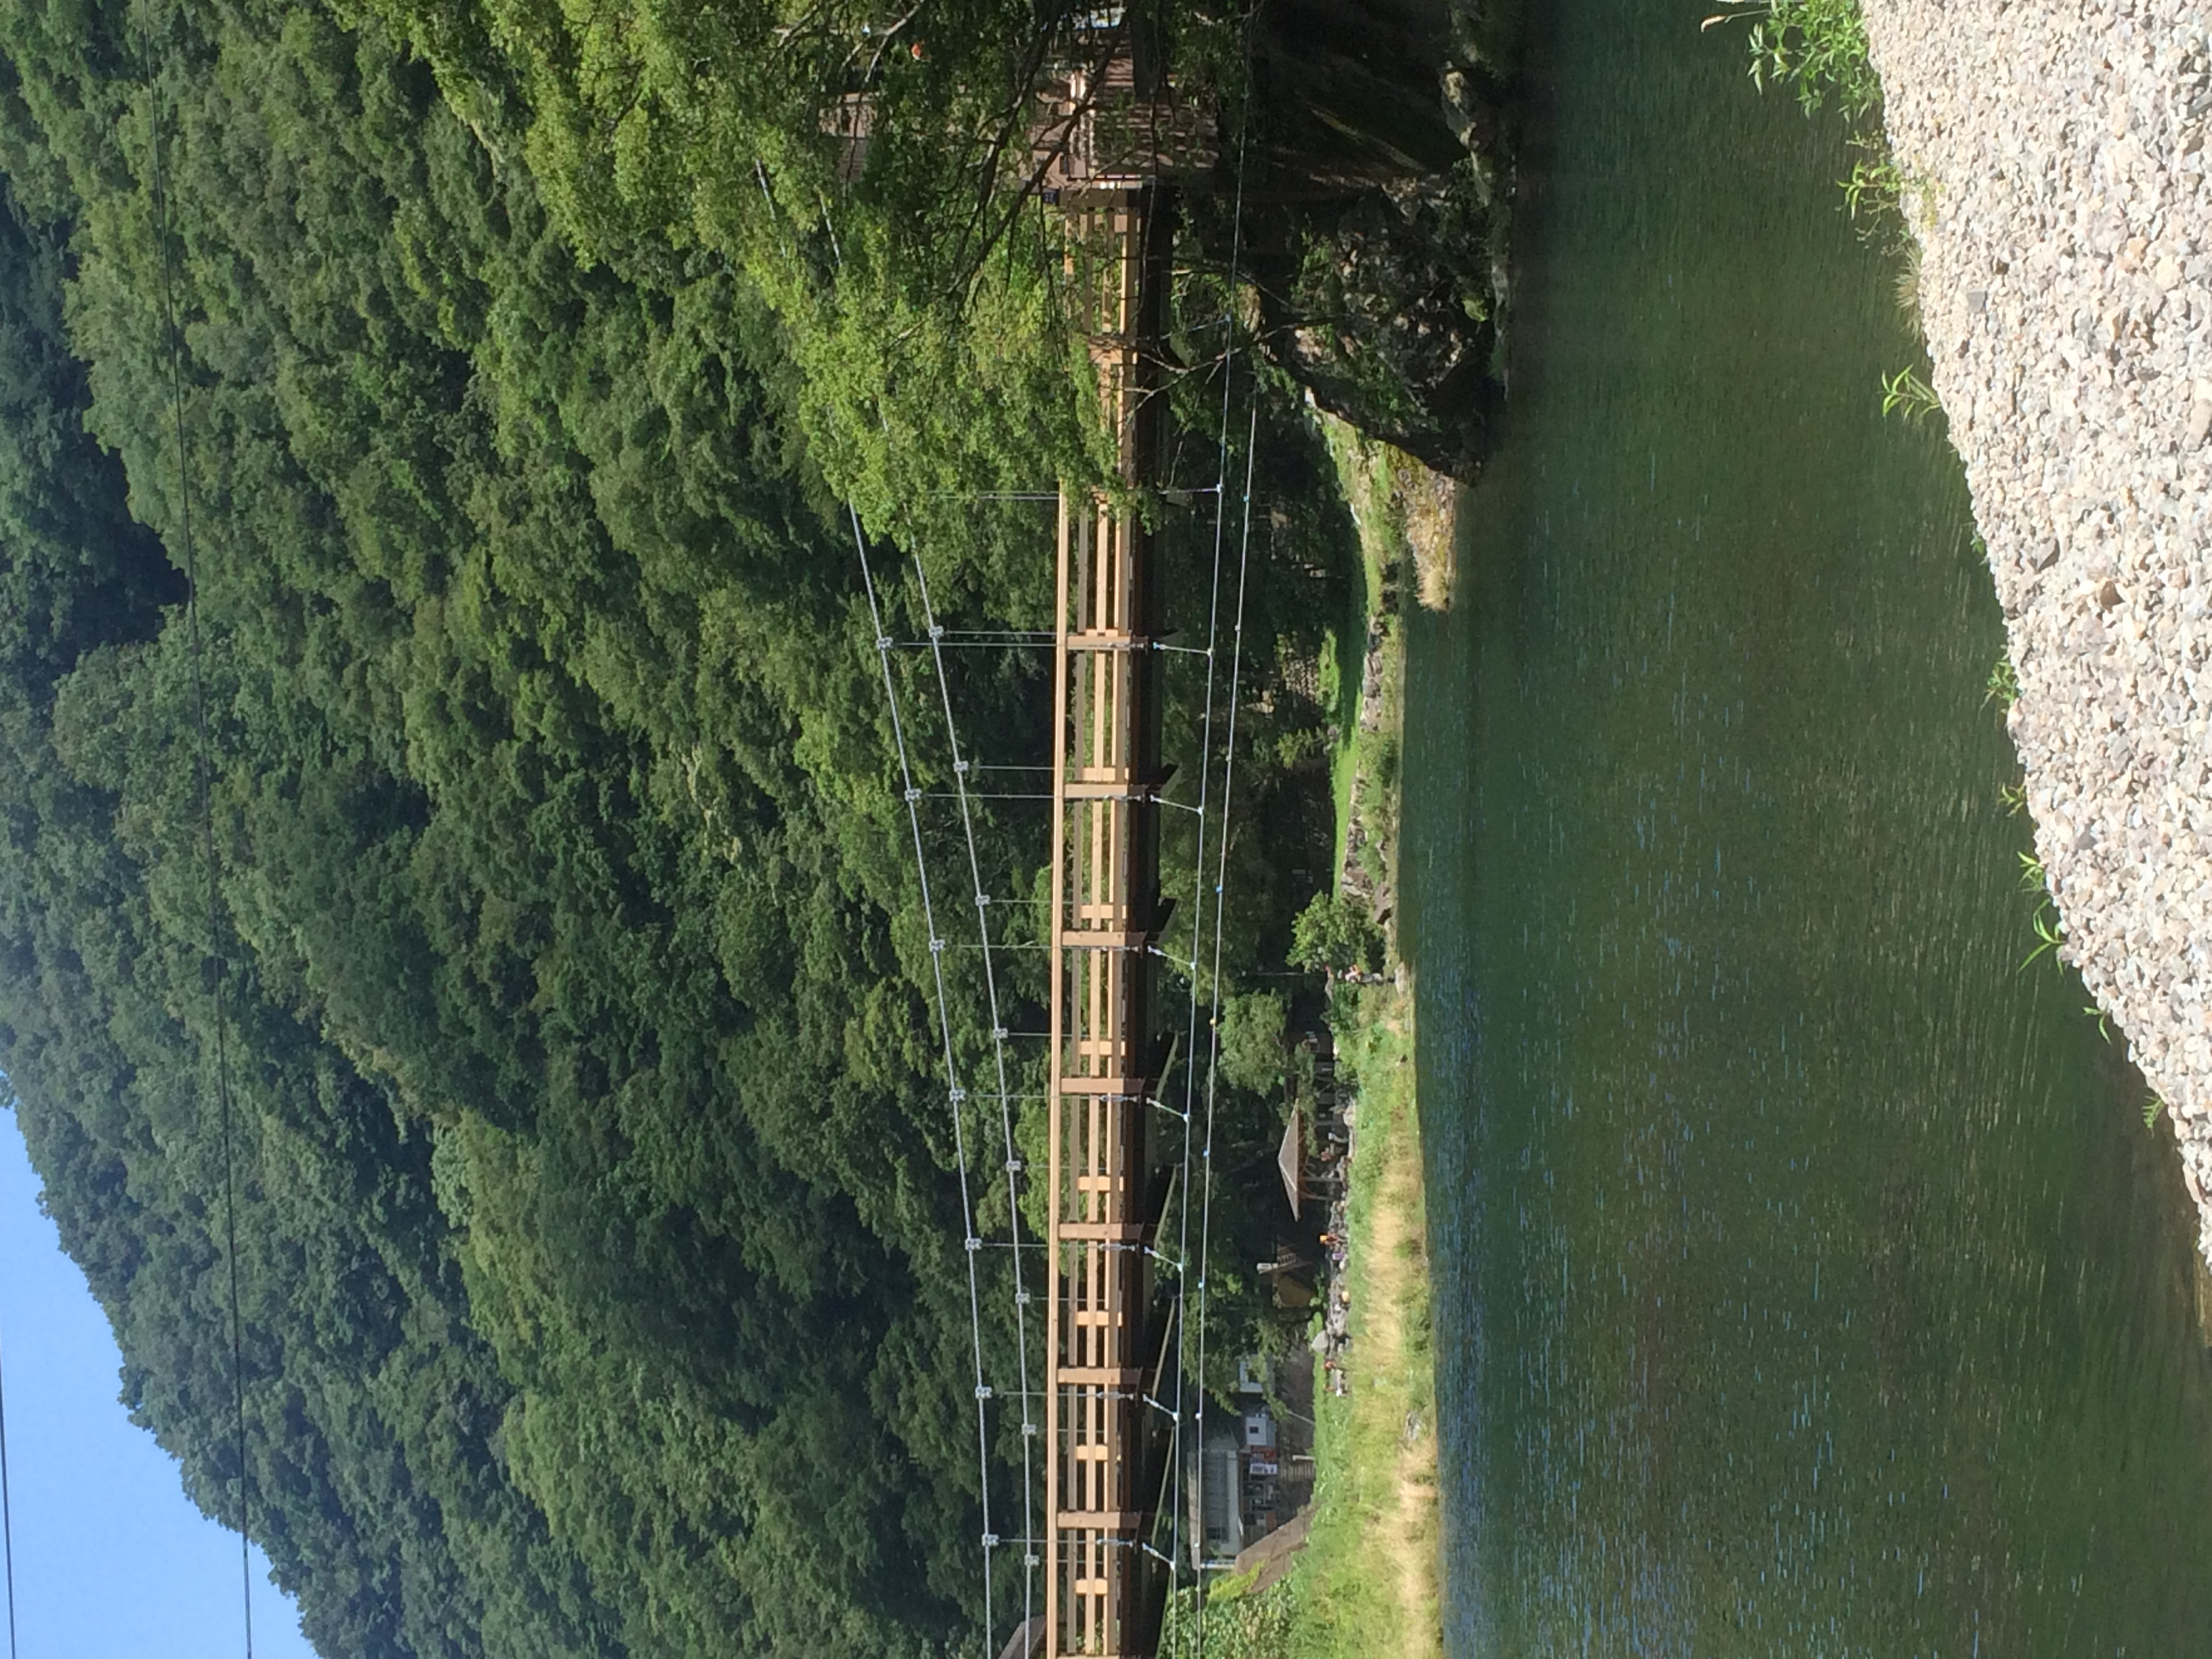 Yorisoi Bashi (Snuggle bridge)